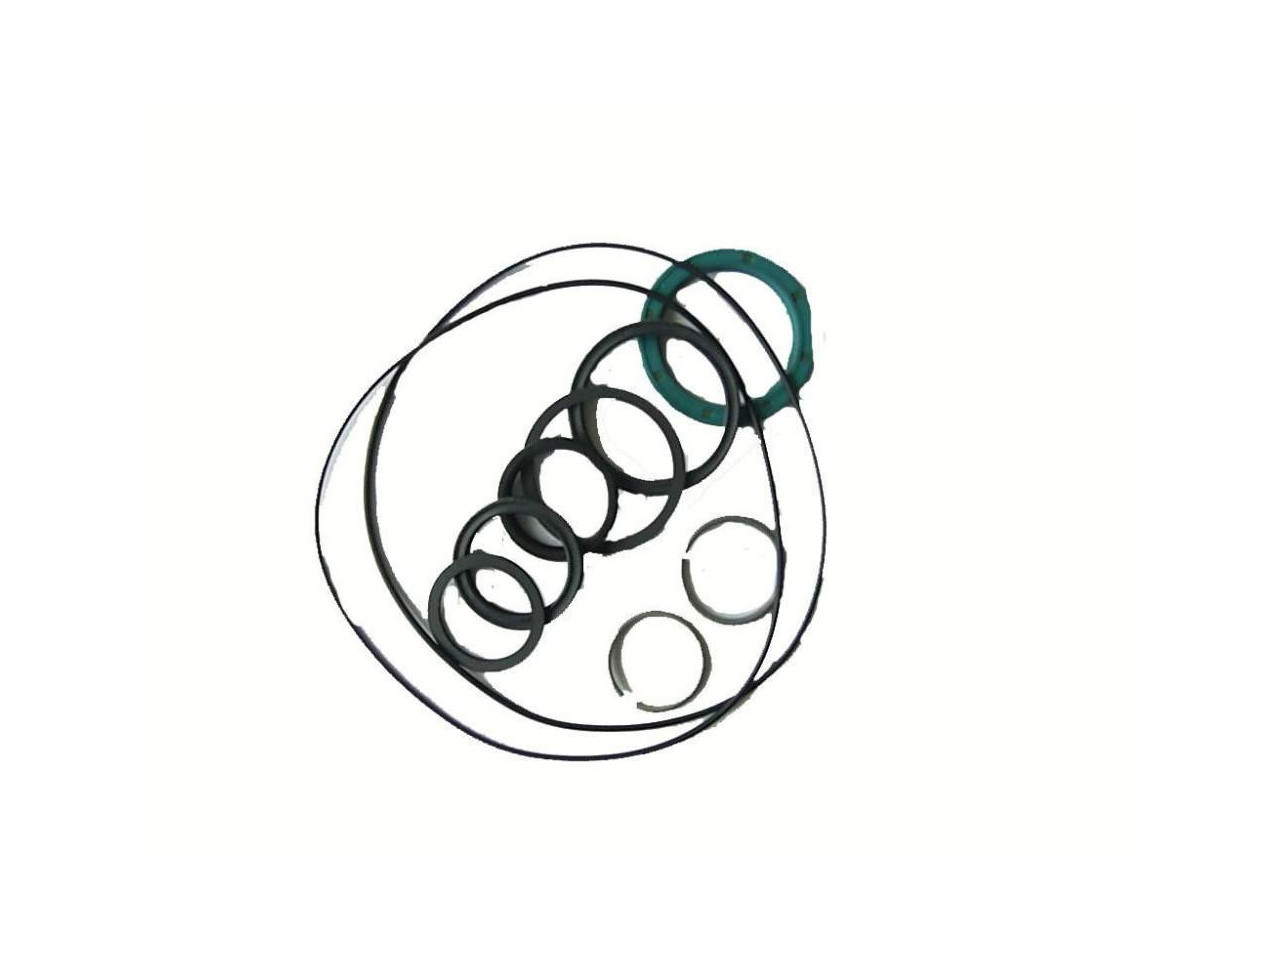 Ремкомплект гидроцилиндра А121.43.01.000-01